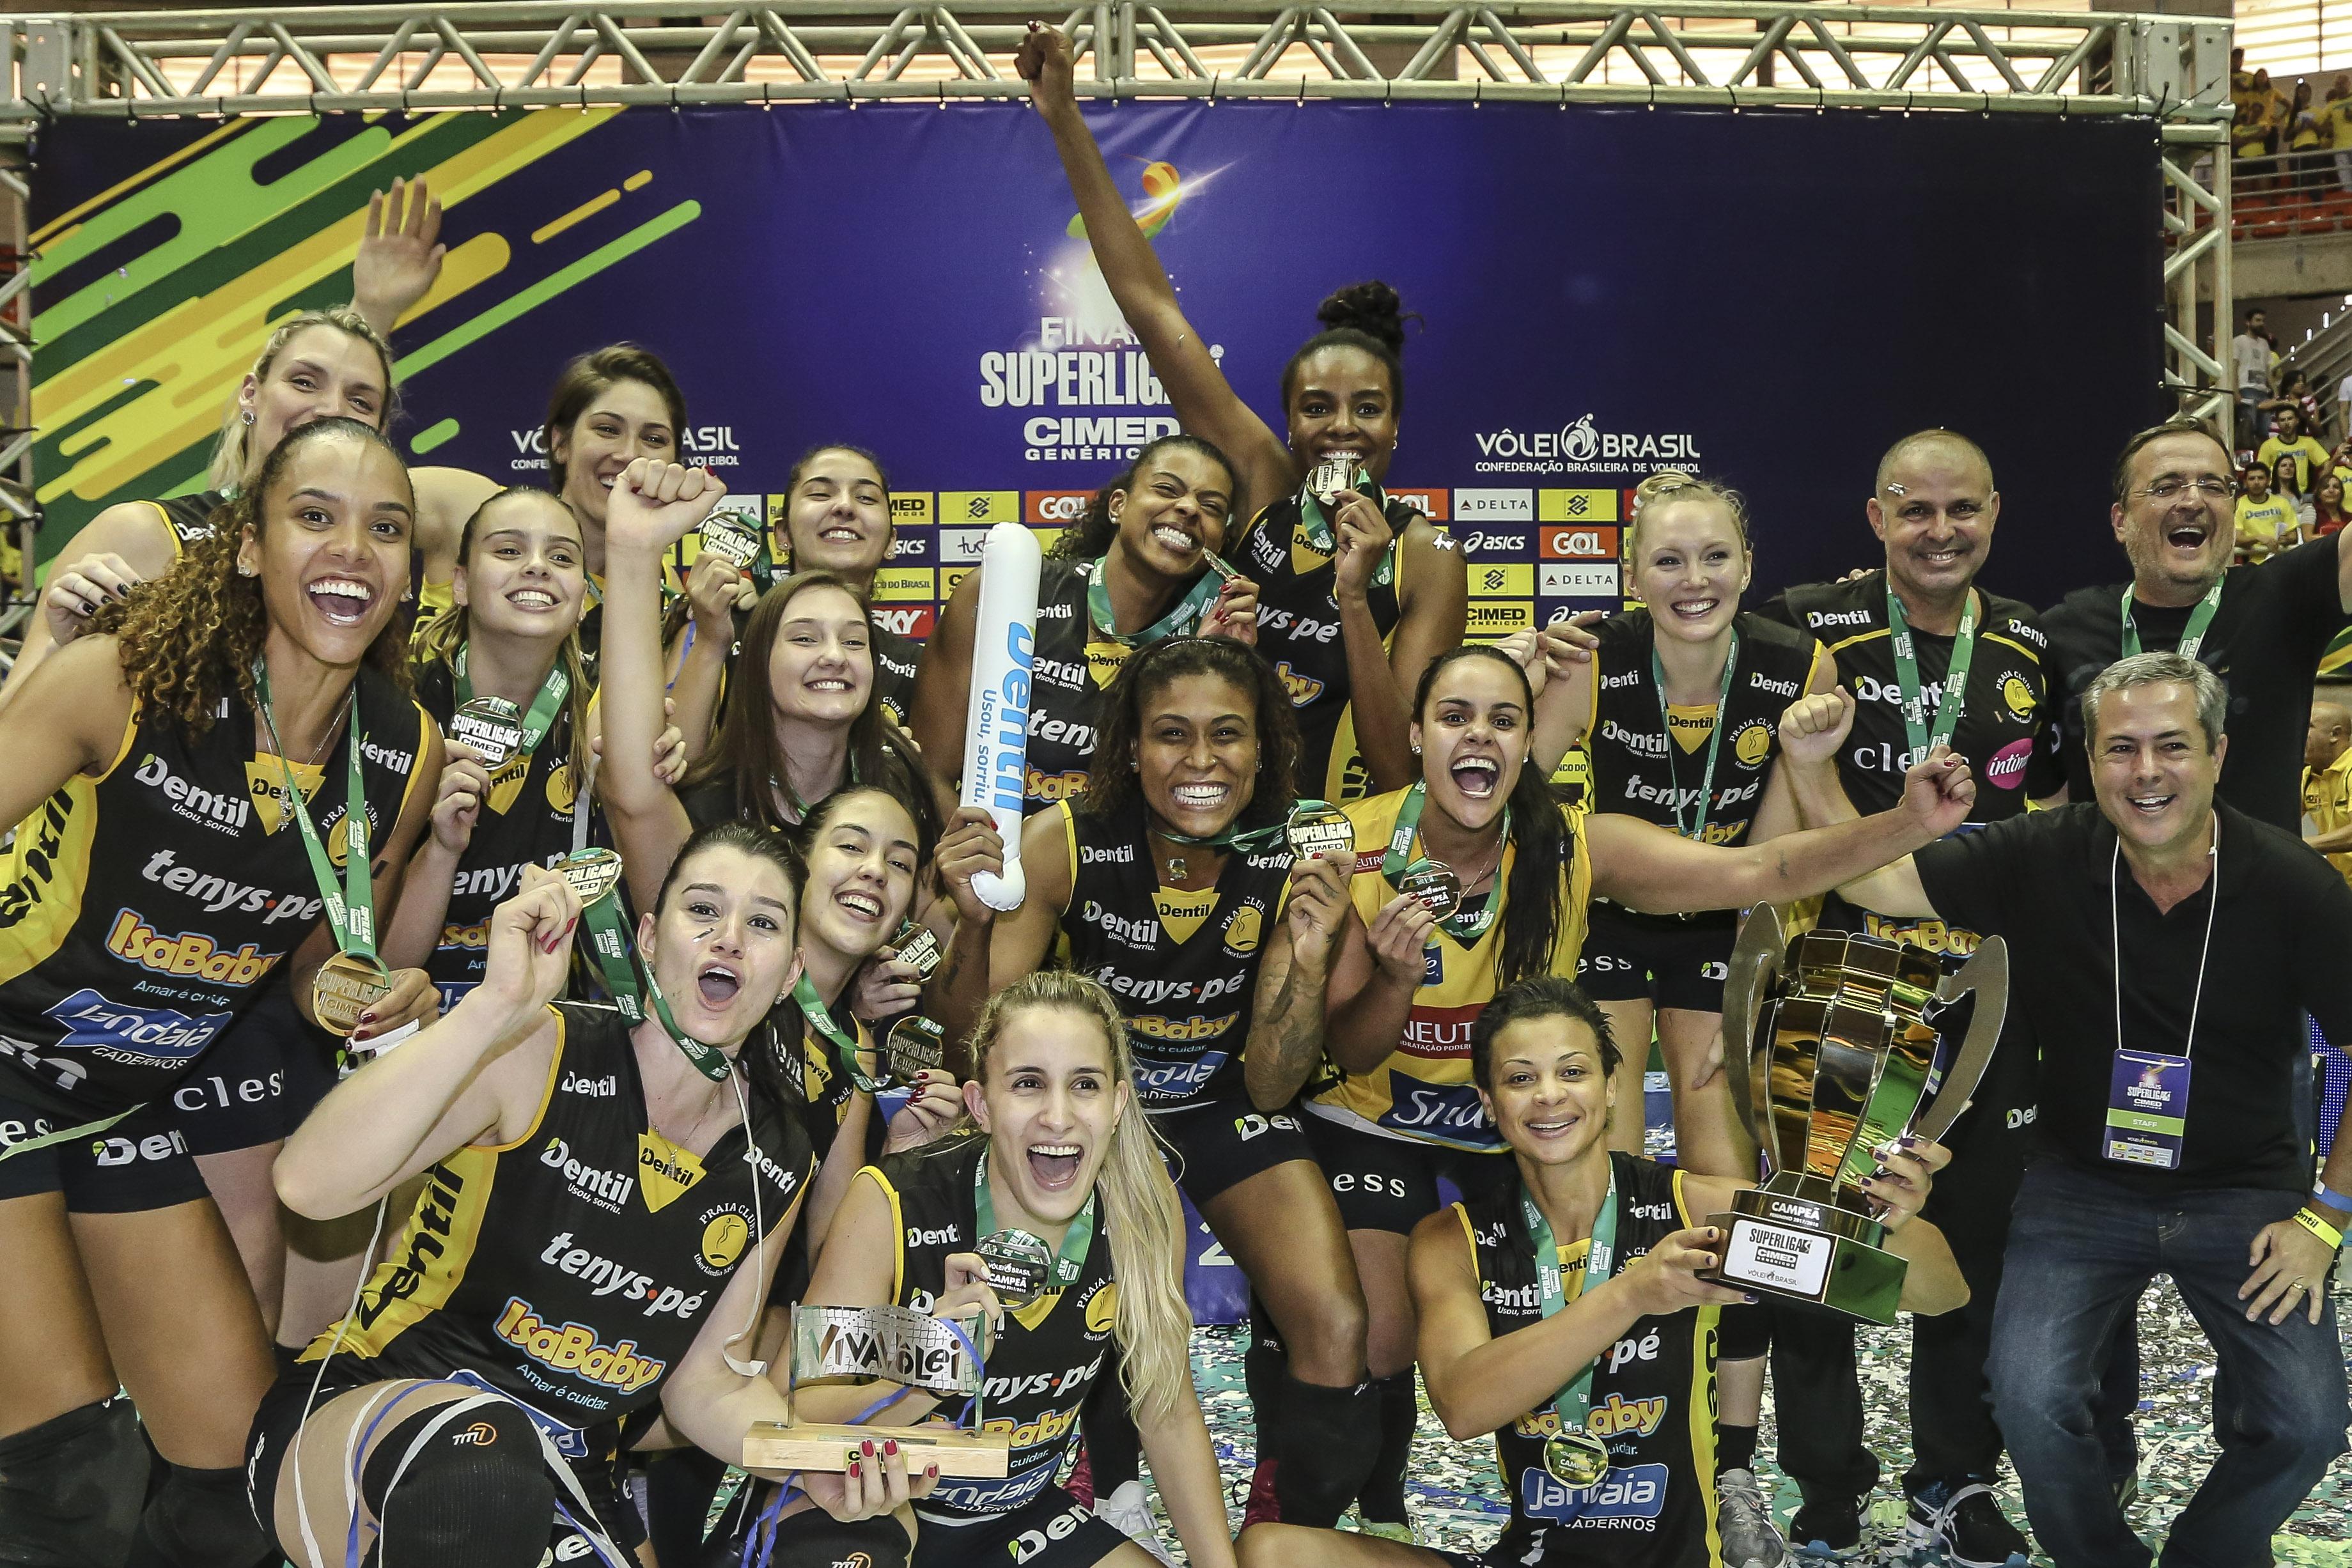 Vôlei Osasco Audax e Dentil/Praia Clube disputam título